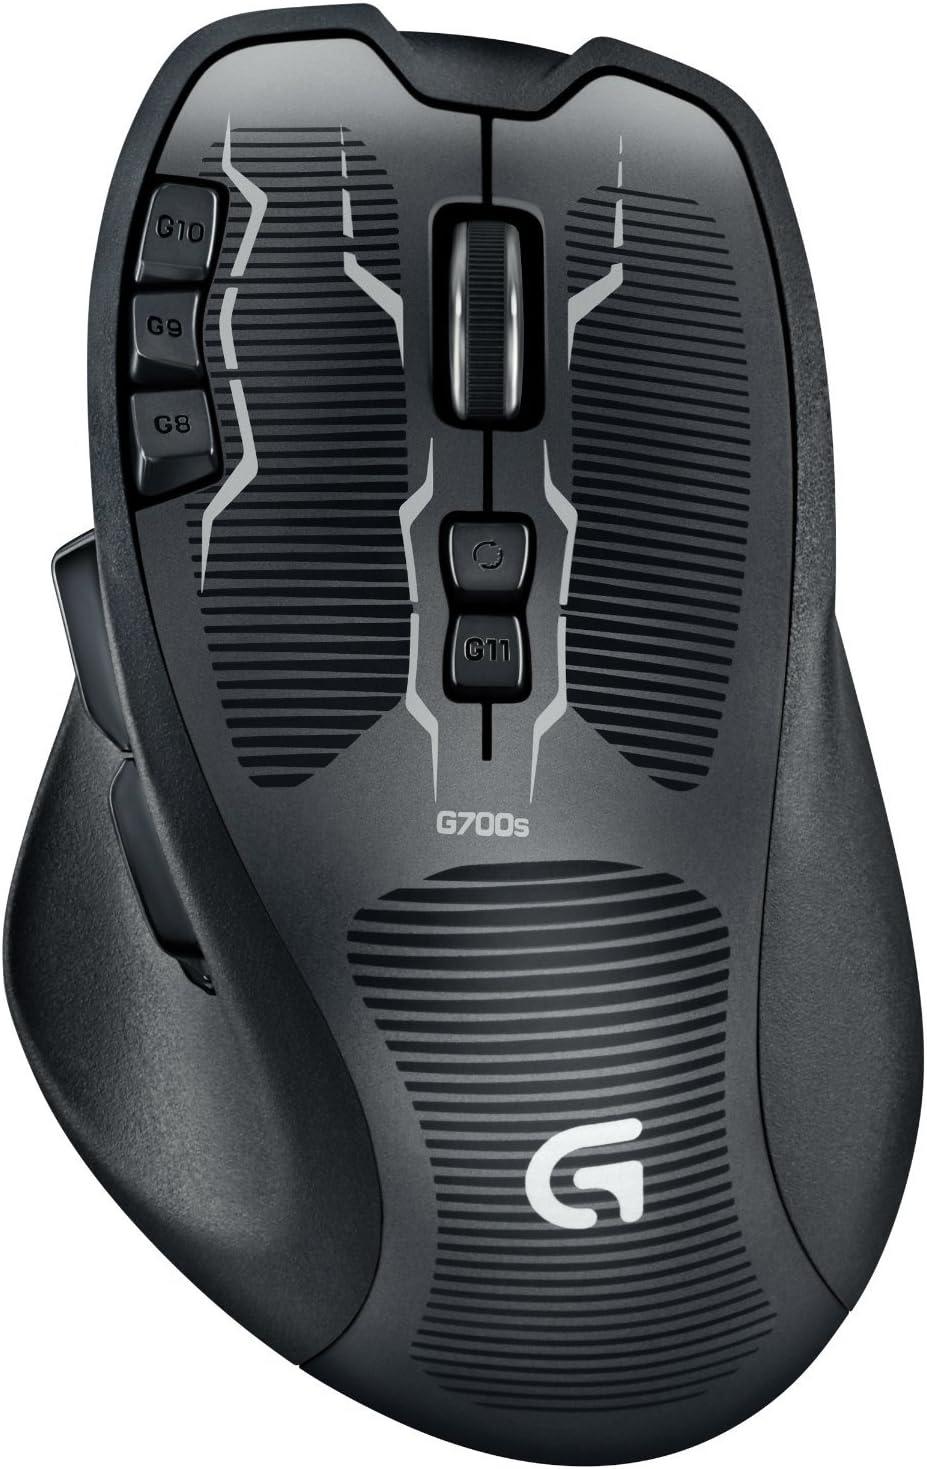 ORIGINAL Logitech G700s G700 Receiver Gaming Mouse USB Wireless Nano Adapter